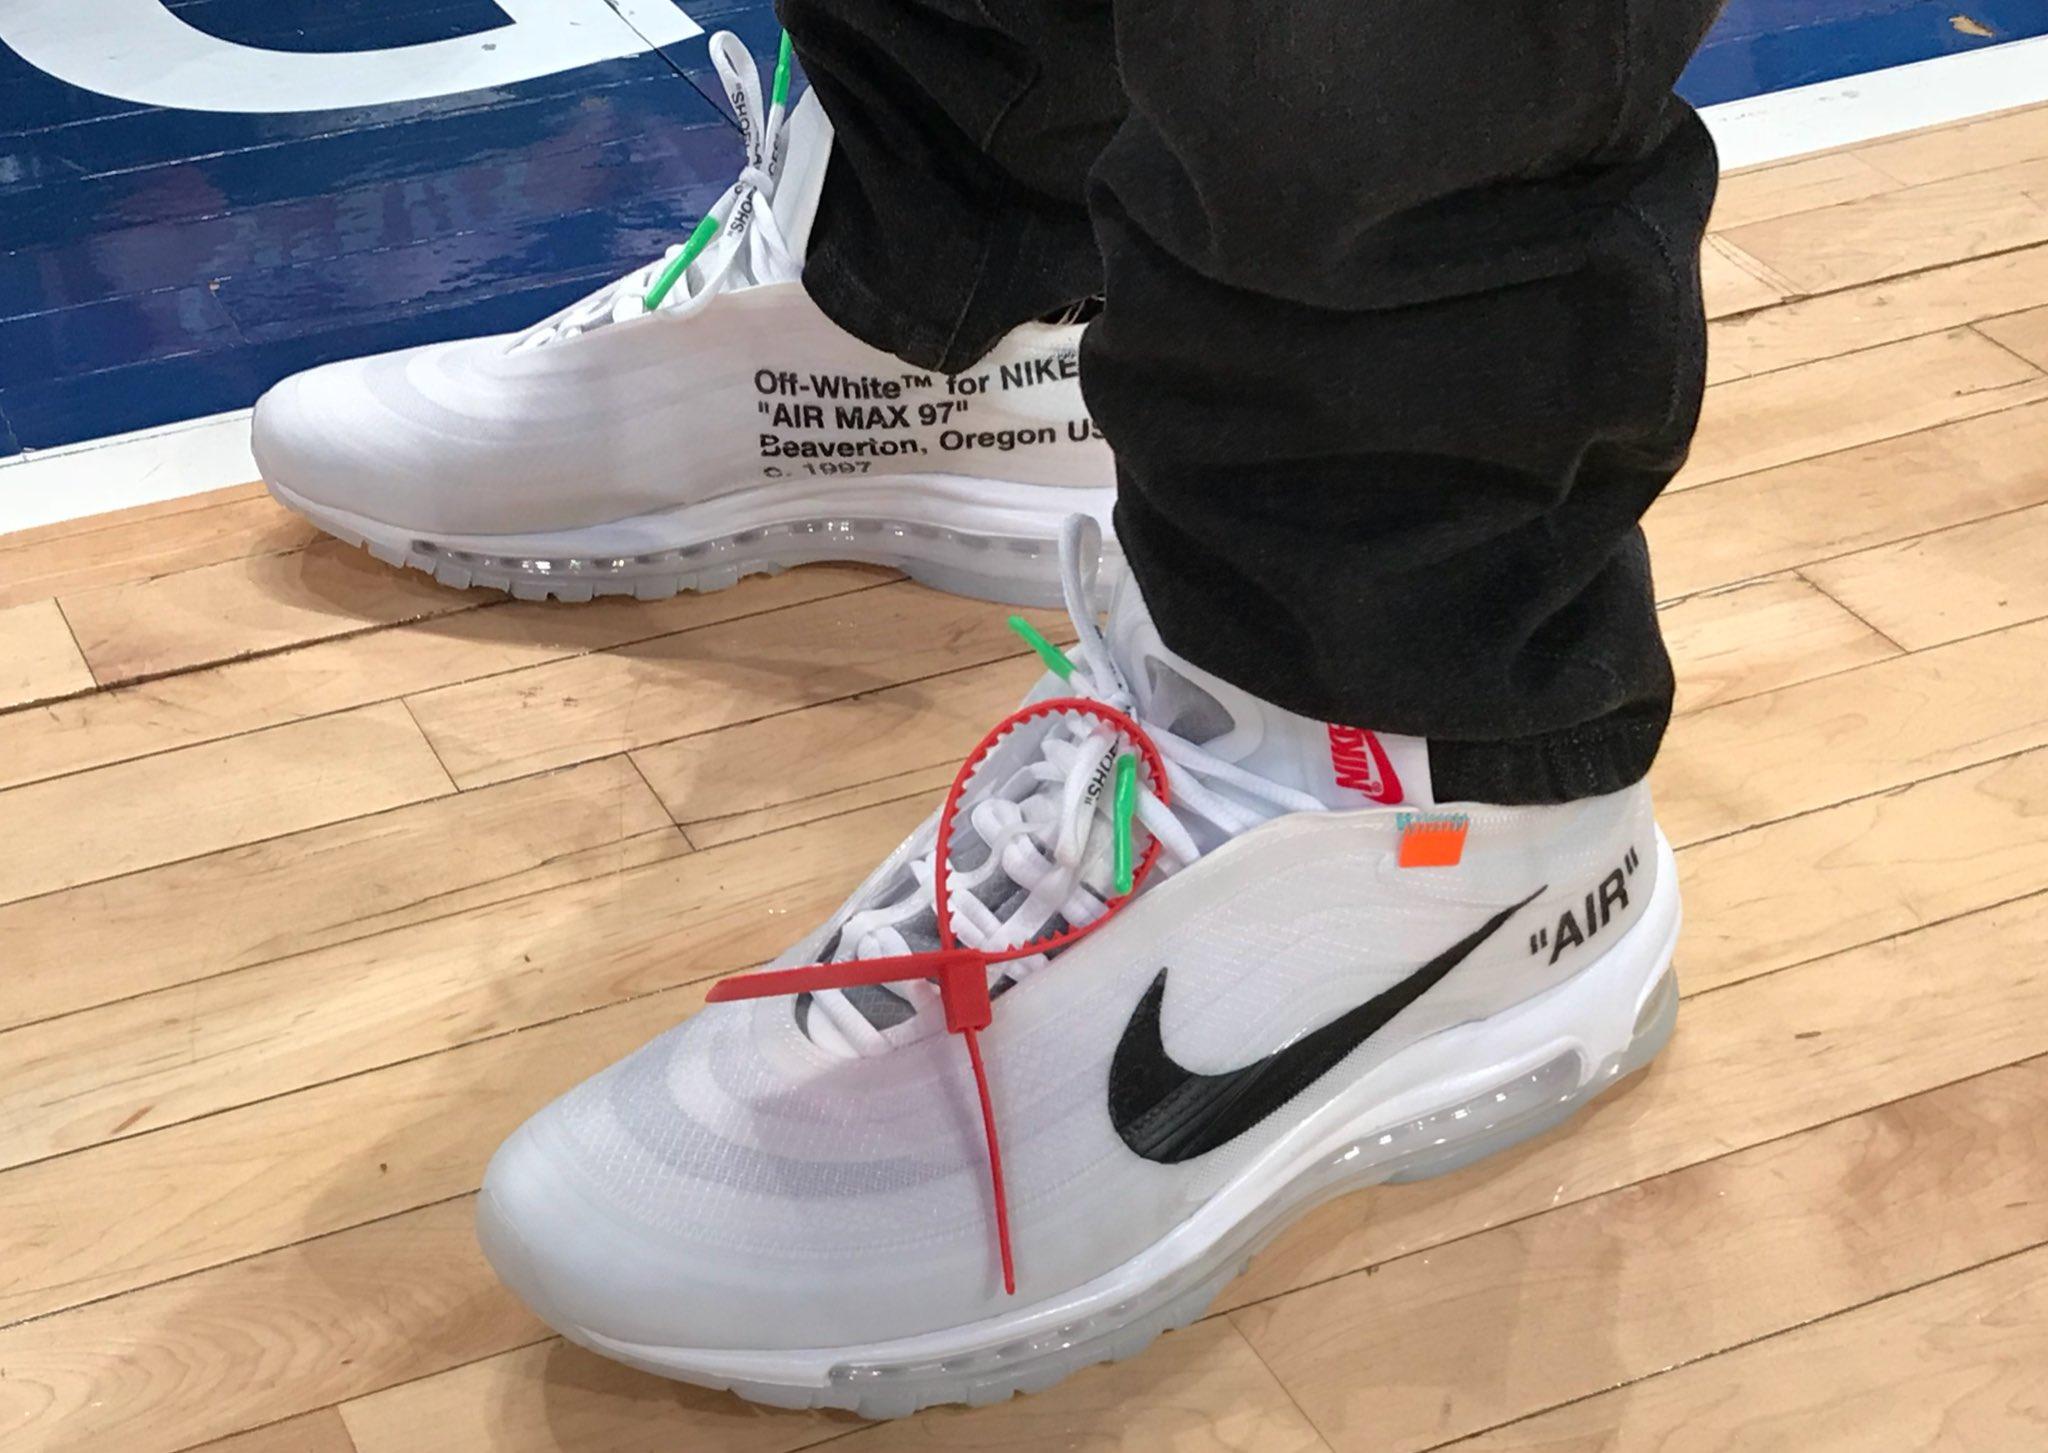 ���� @isaiahthomas' #NBAKicks ���� https://t.co/edJ1pyeZPx